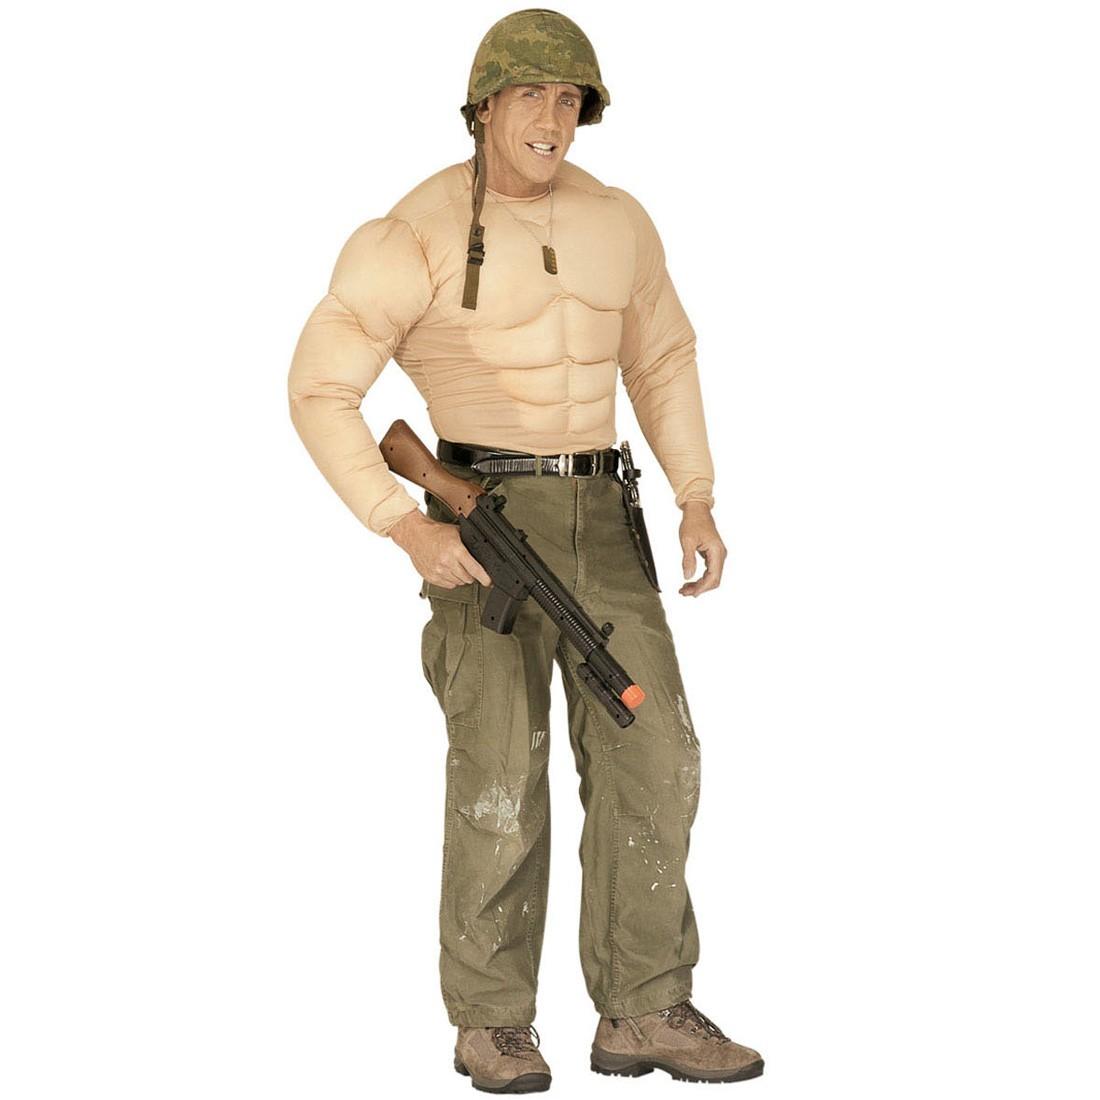 Muskel Kostüm Bodybuilder Muskelshirt Kostüme Gr XL, 23,99 €